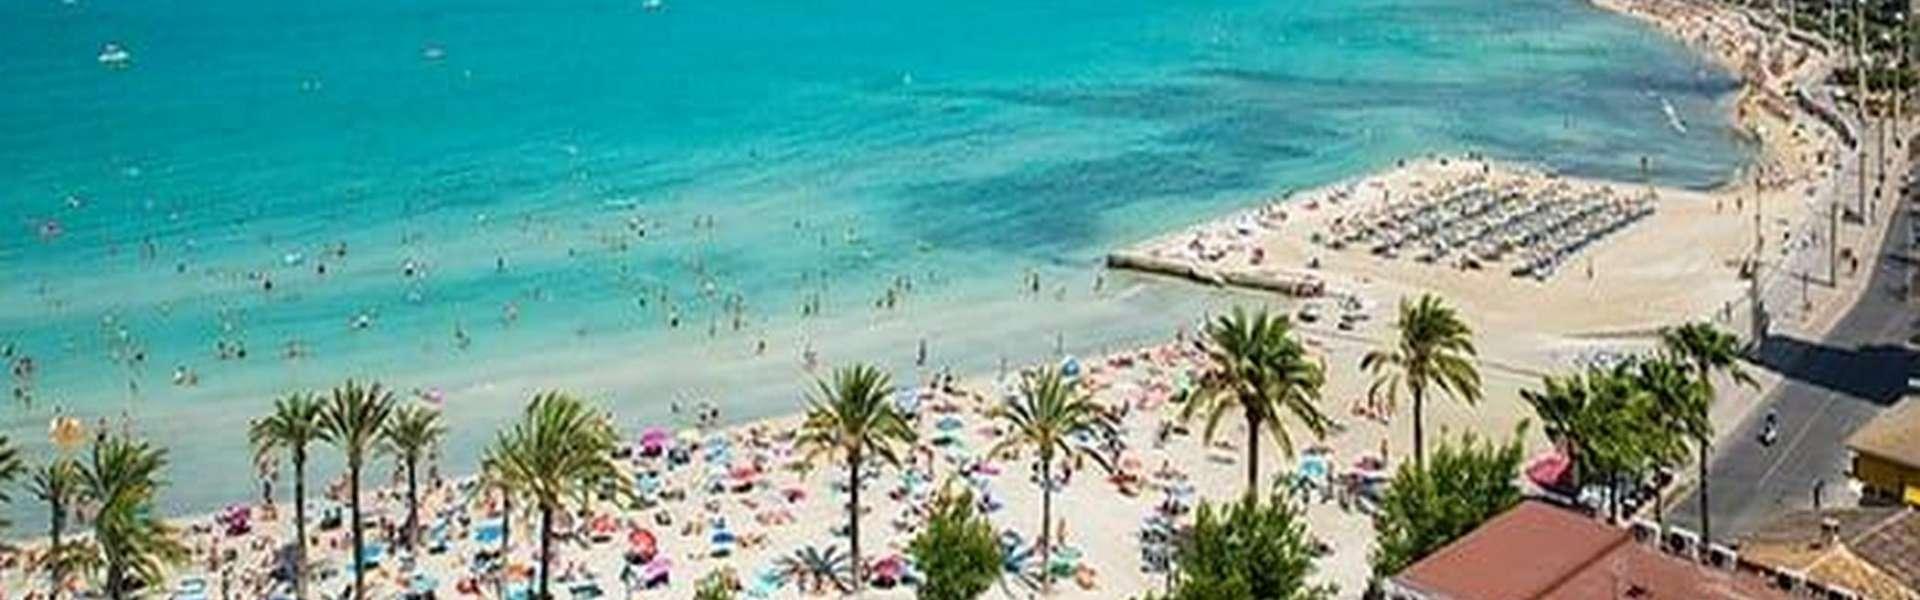 Palma/Playa de Palma - Renovierungsbedürftiges Chalet in Strandnähe